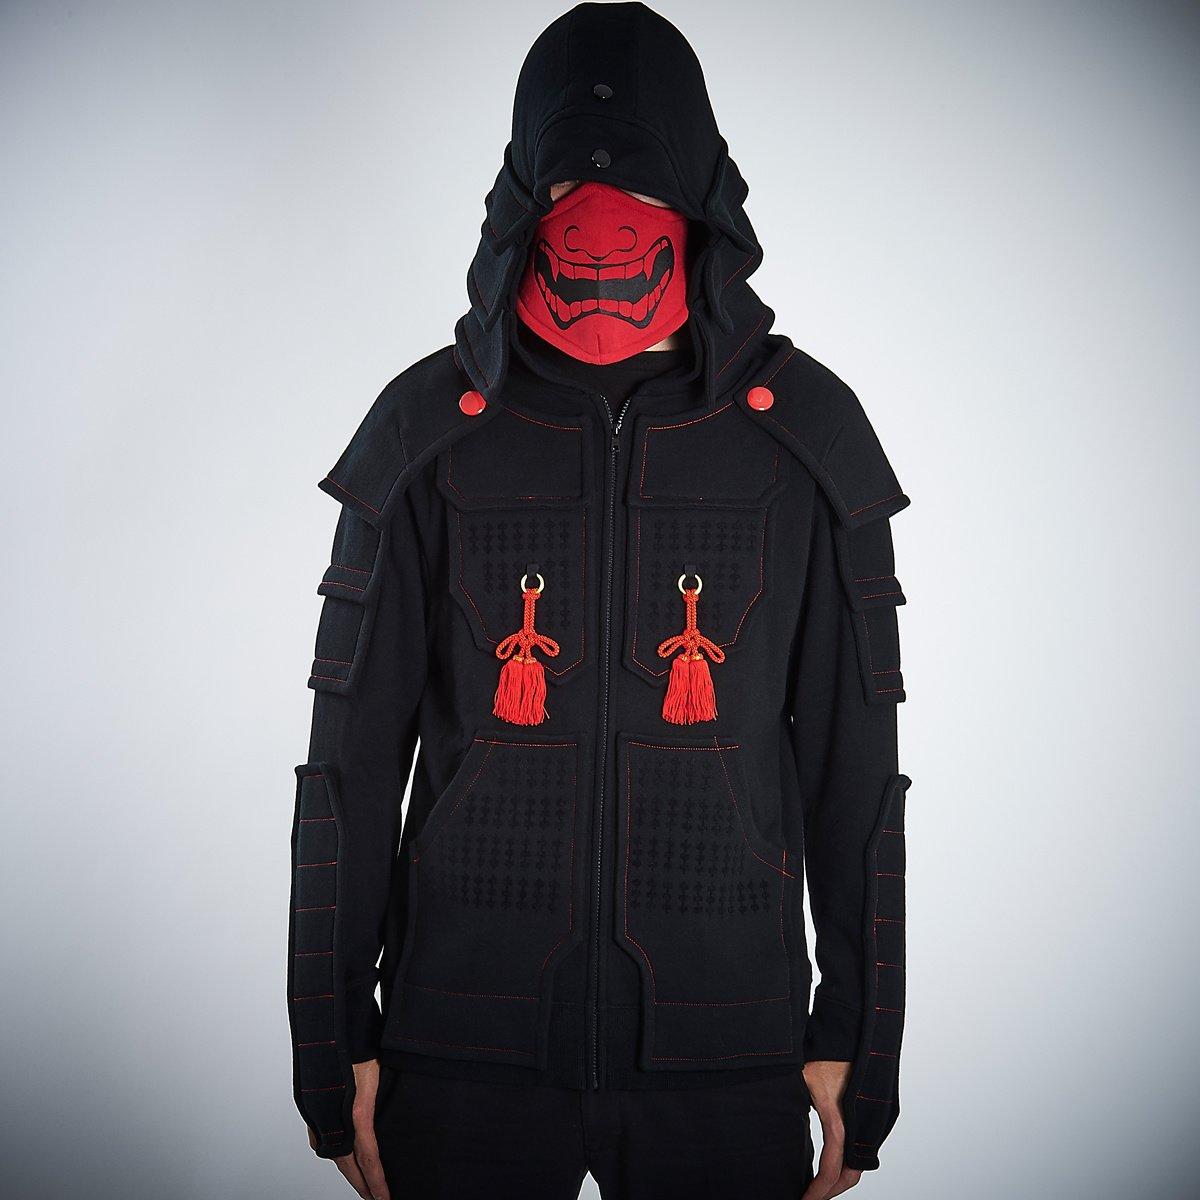 Samurai hoodie